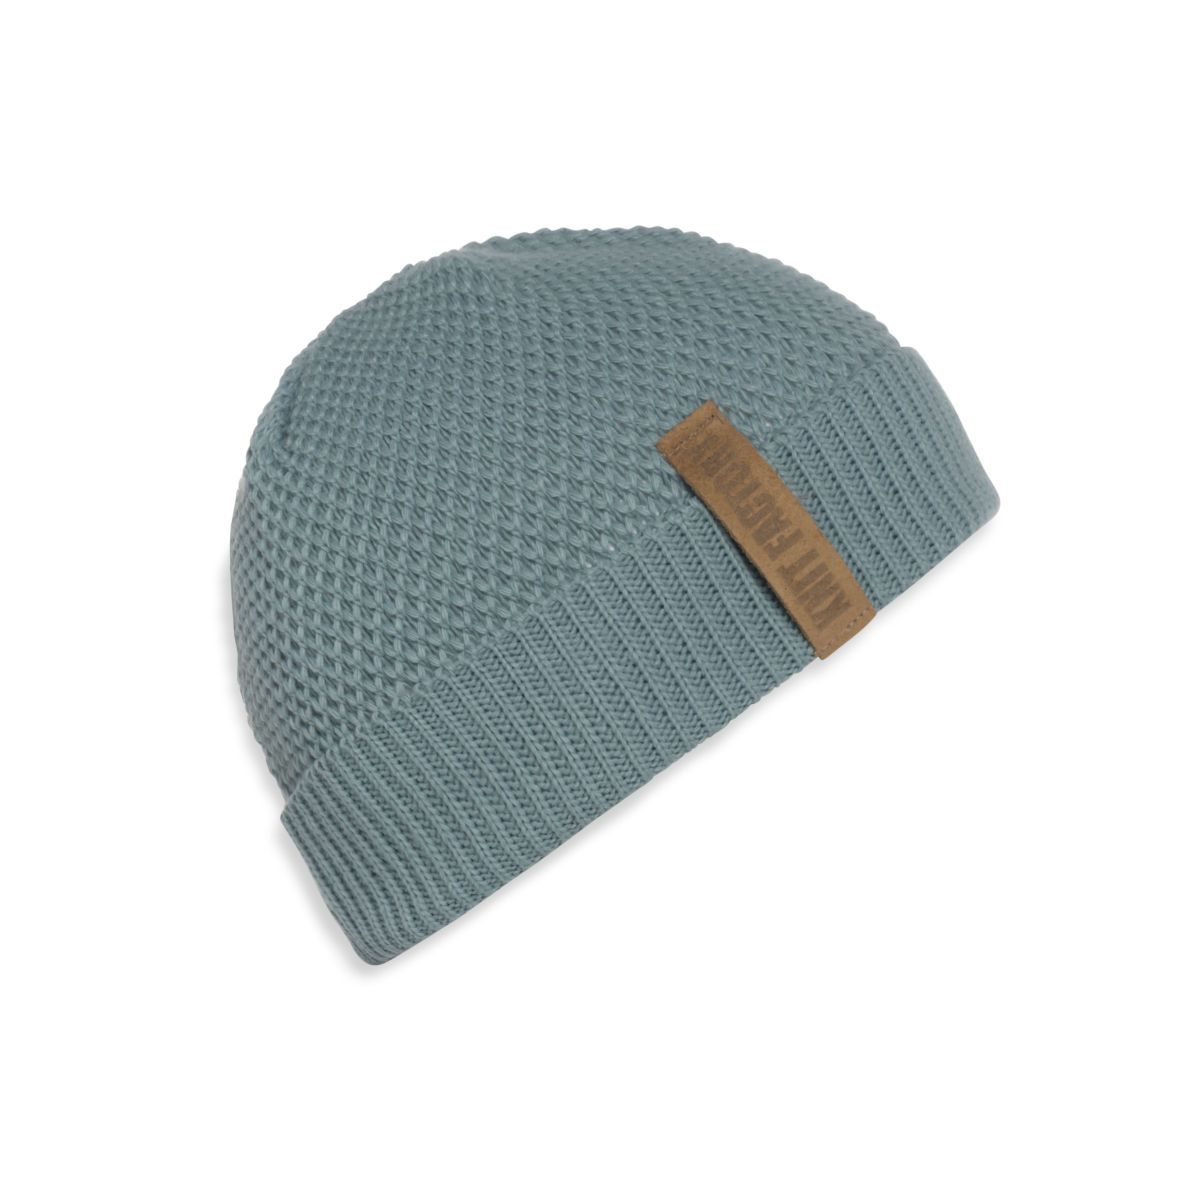 knit factory 1237009 jazz beanie stone green 1